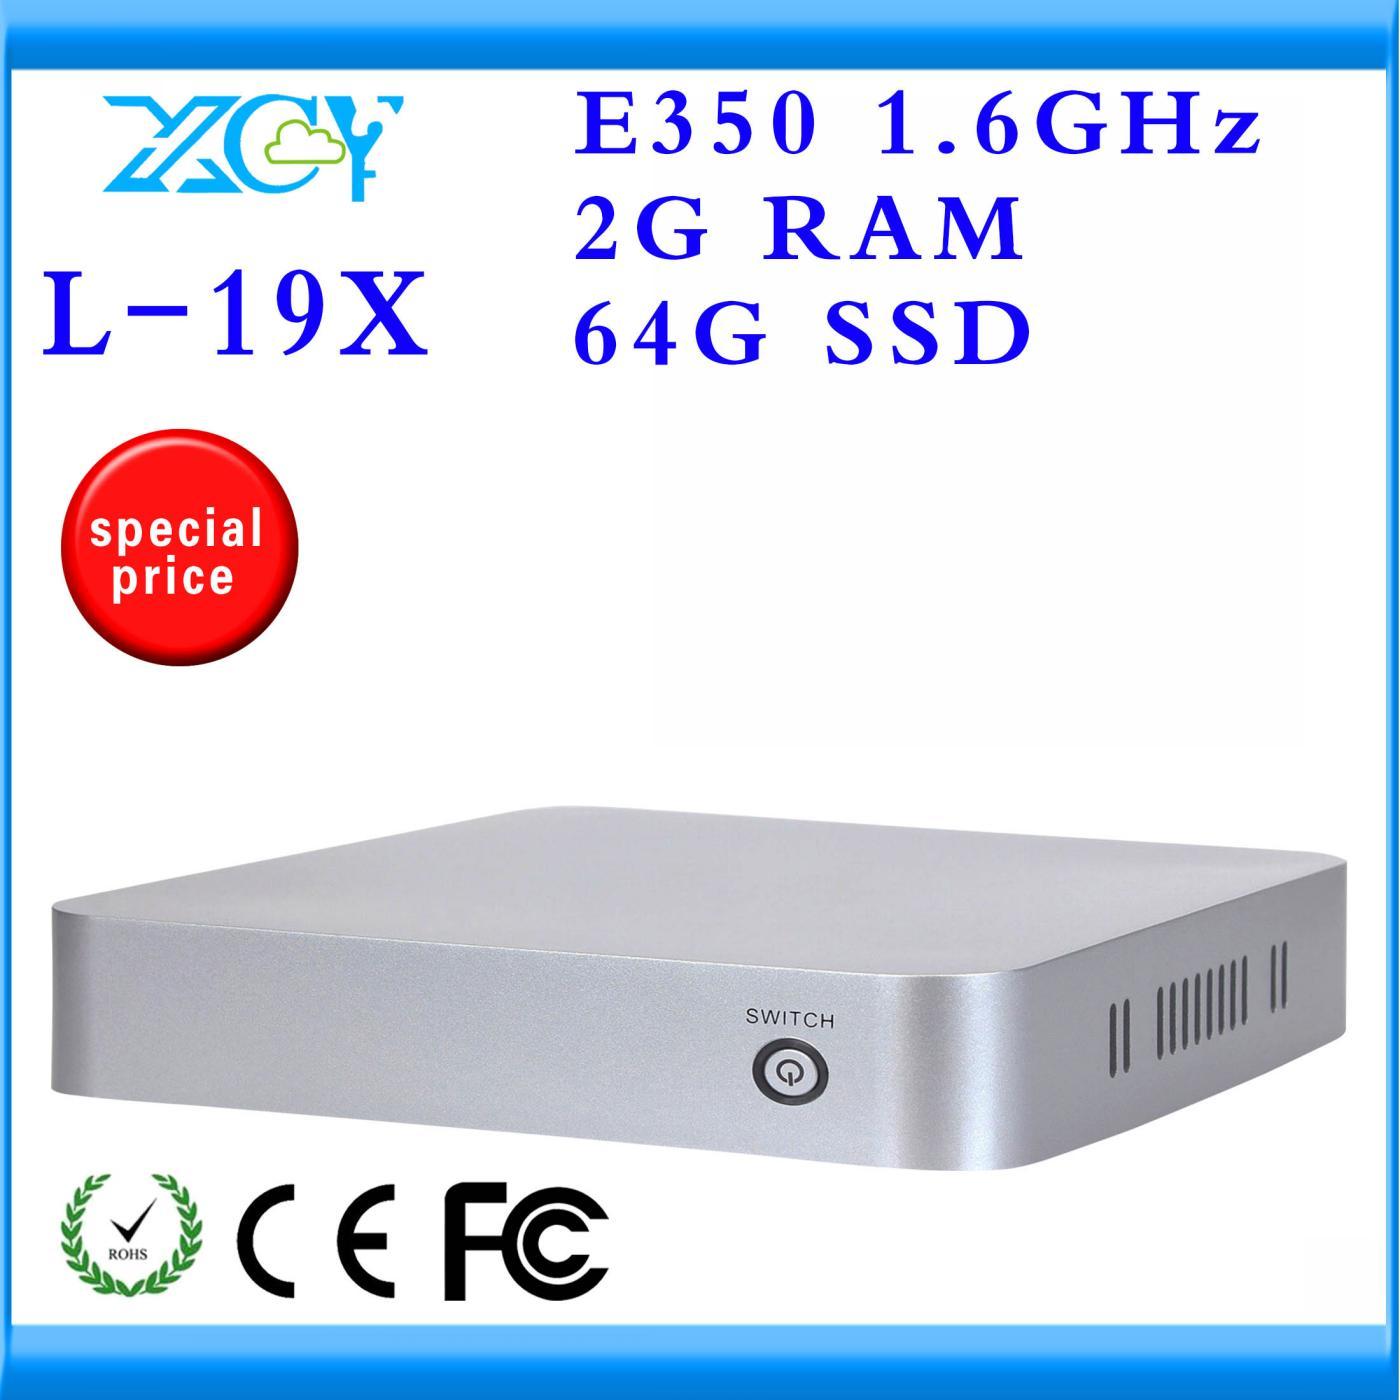 car pc IPC htpc intel dual core case ,computer case atx pc station case price upport WIN7, Linux, Windows XP, Ubuntu Debian !(China (Mainland))